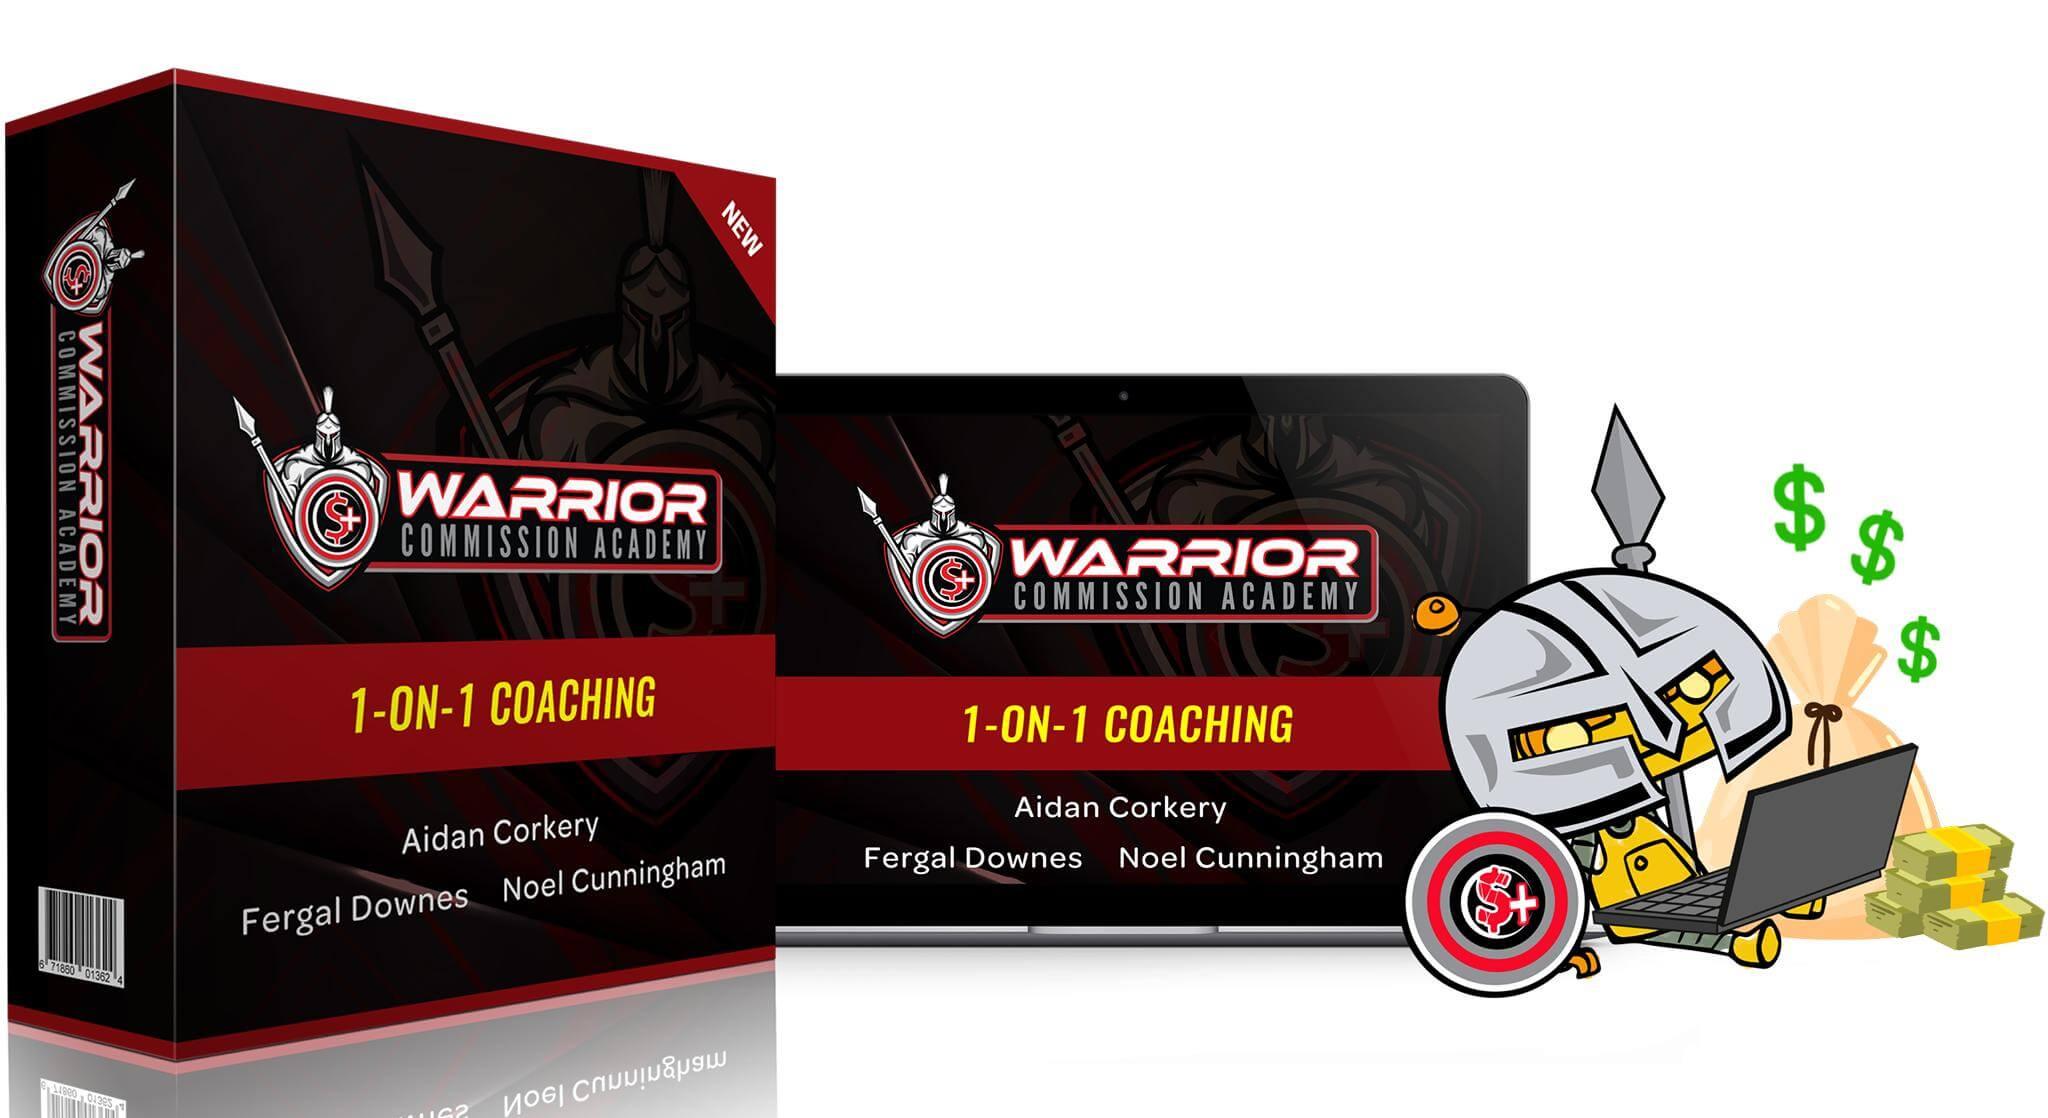 Warrior-Commission-Academy-OTO-4